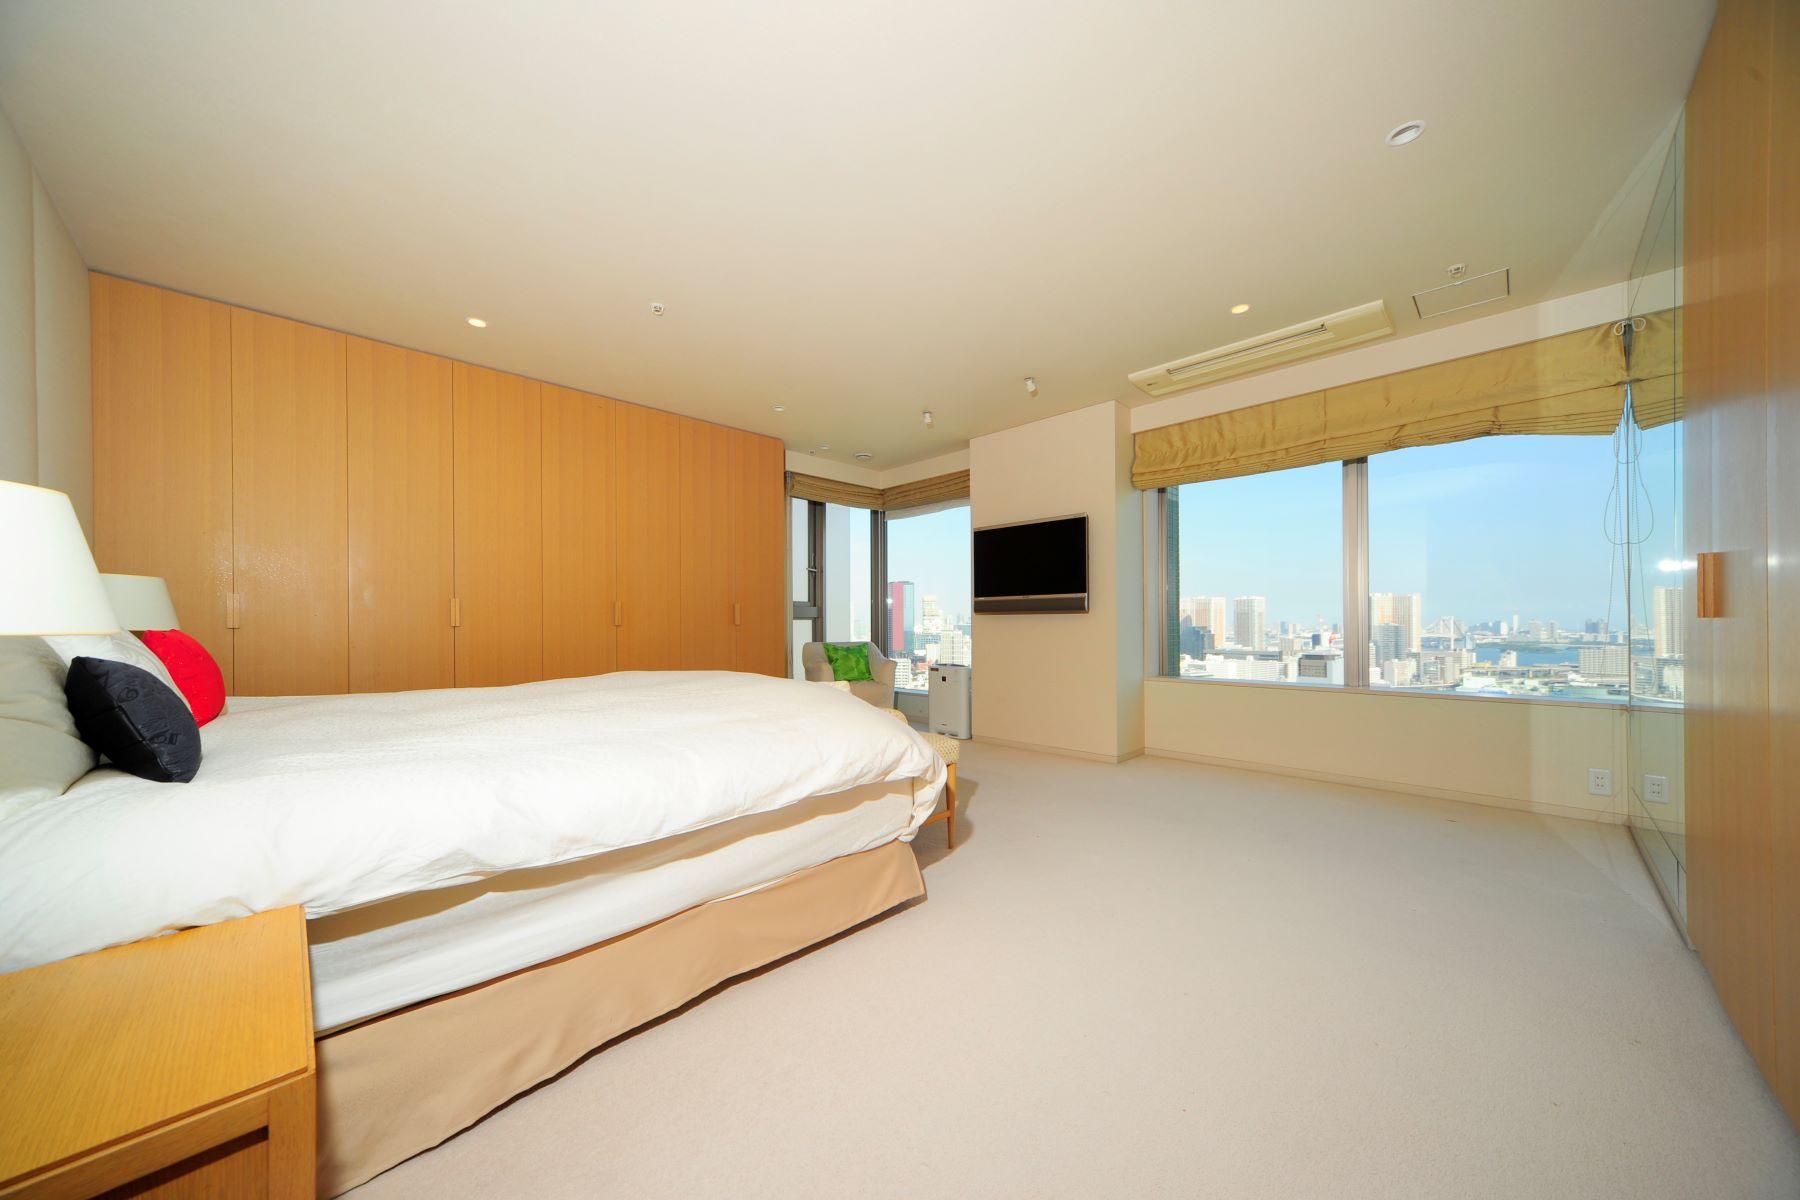 Additional photo for property listing at City Tower Takanawa Takanawa, Minato-Ku, Tokyo Japan